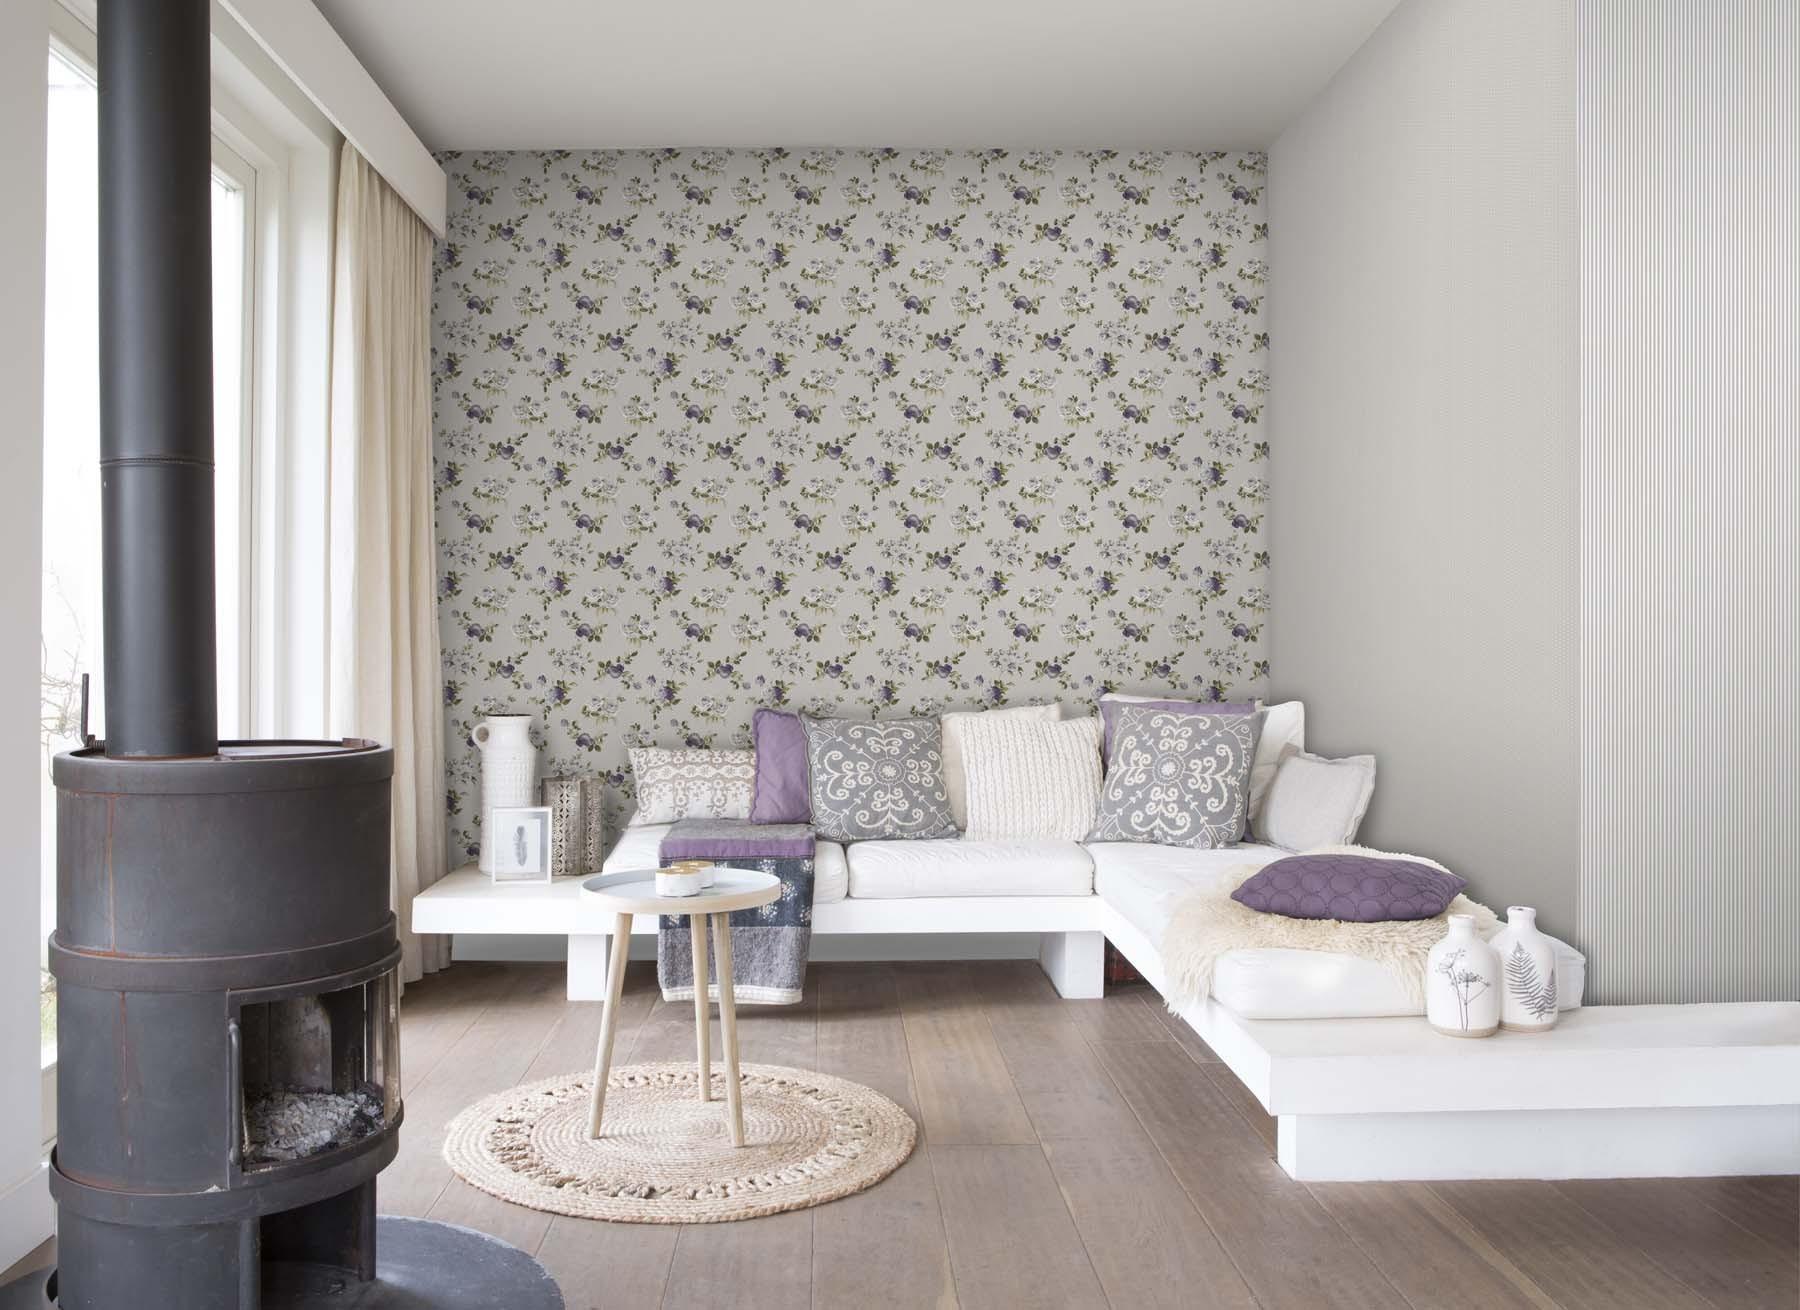 petite fleur 4 tapeten rasch textil gratisversand. Black Bedroom Furniture Sets. Home Design Ideas